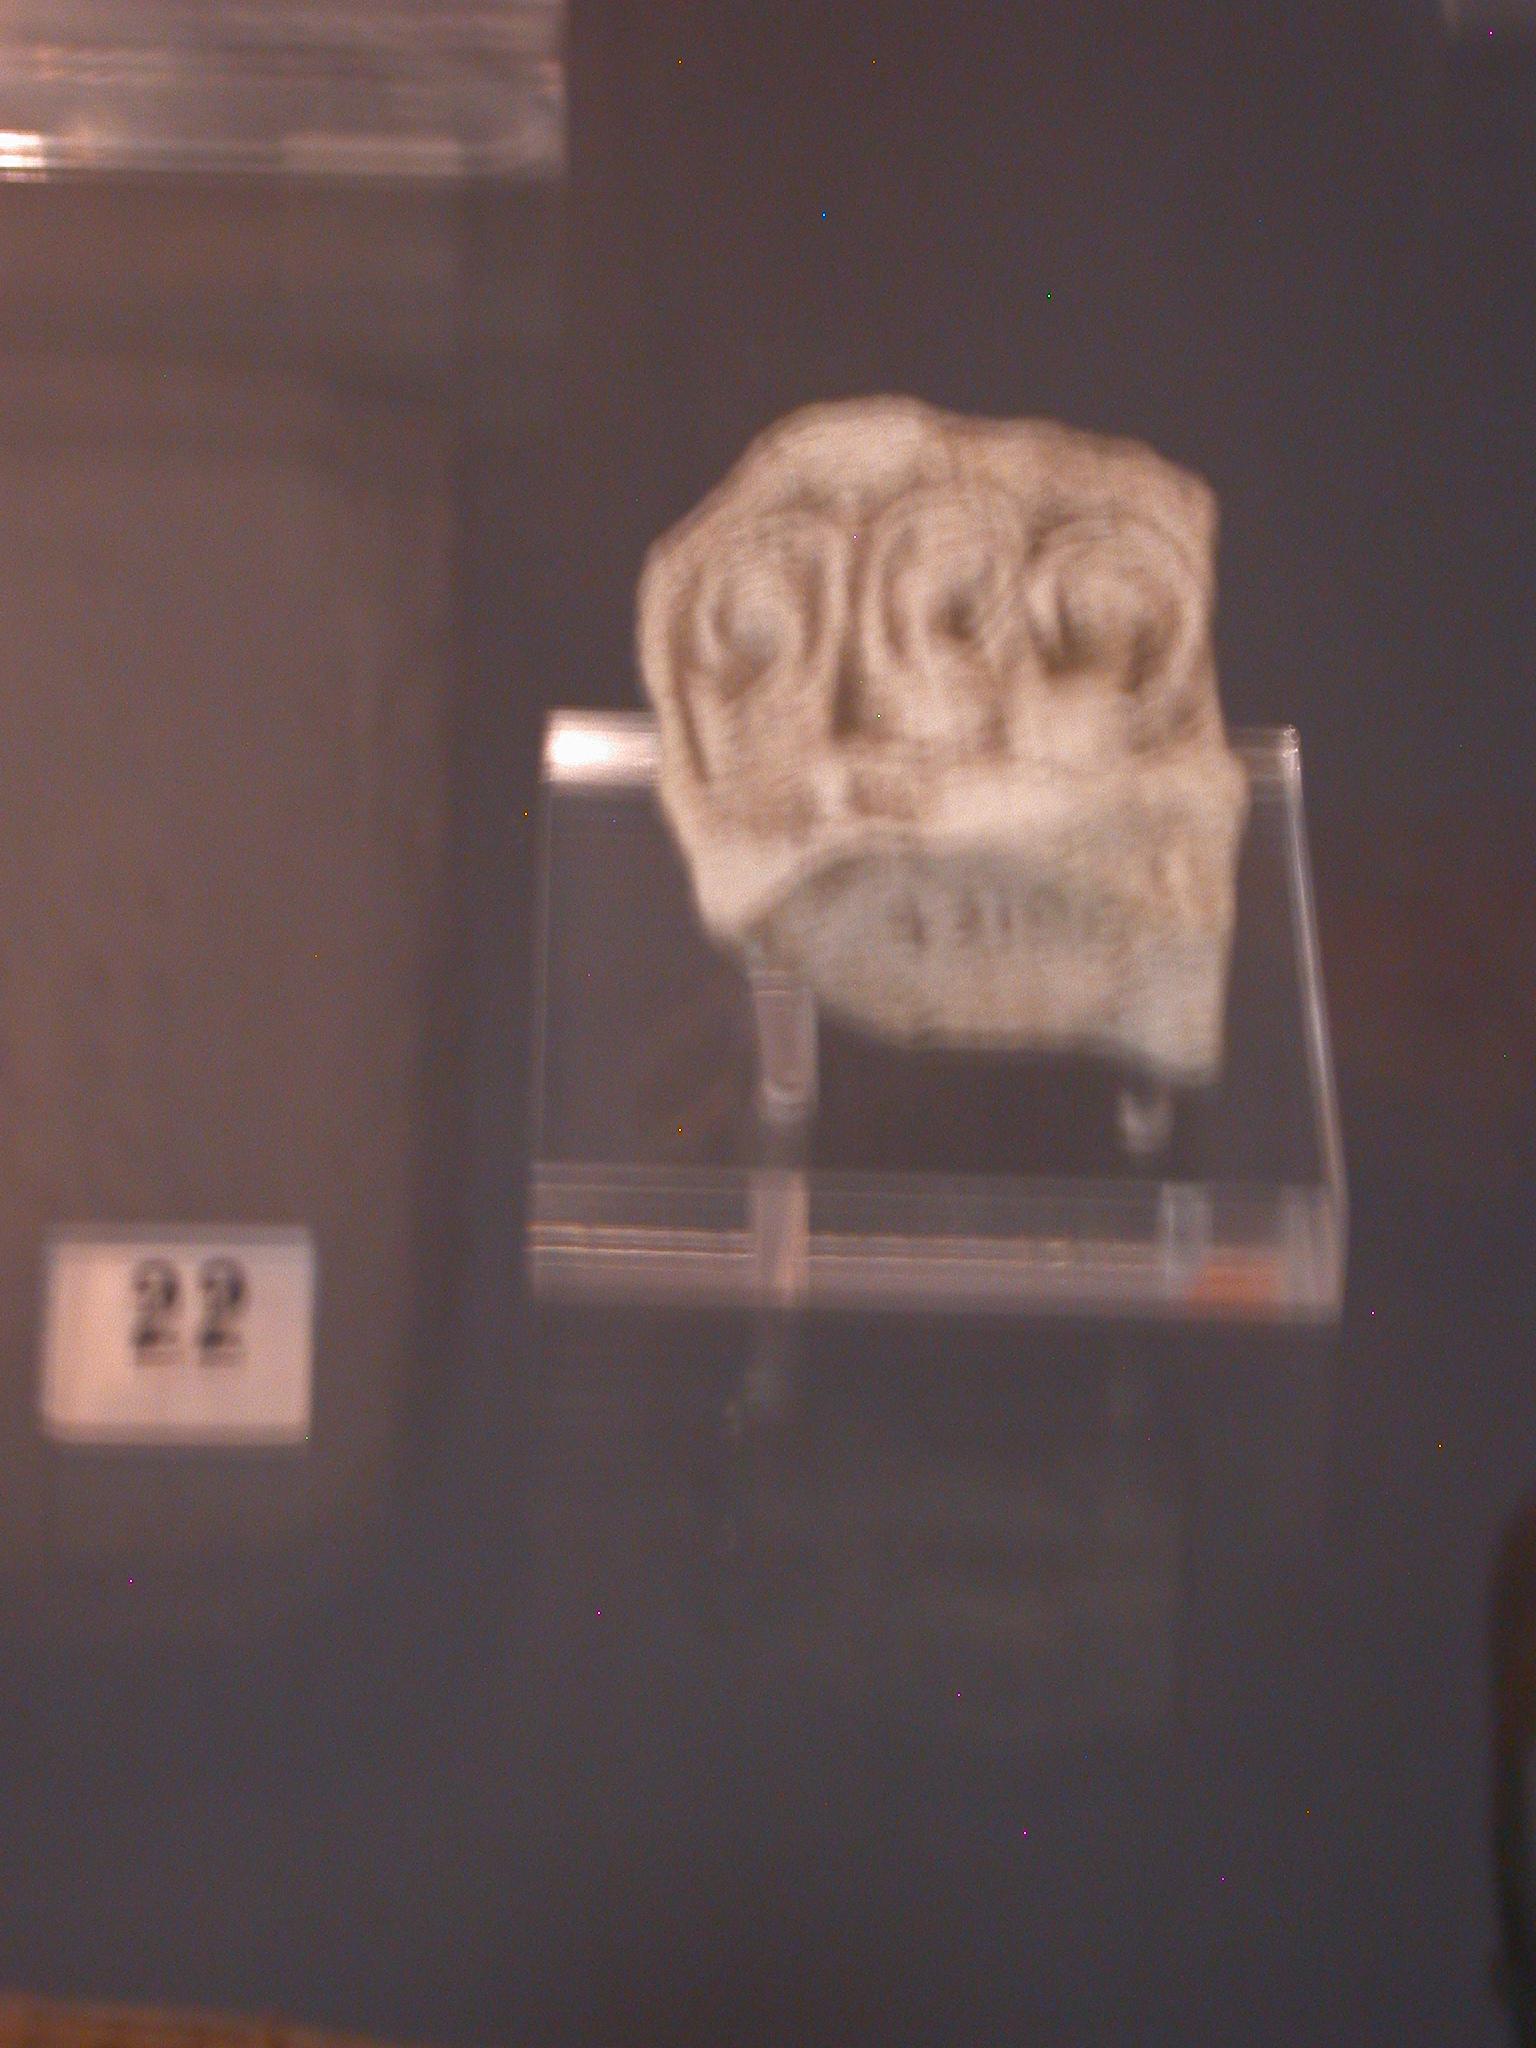 Ear Stela, Limestone, Probably Dynasty 18 Temple of Hatshepsut, Found at Montuhotep Temple, Deir el Bahri, Egypt, in Fitzwilliam Museum, Cambridge, England